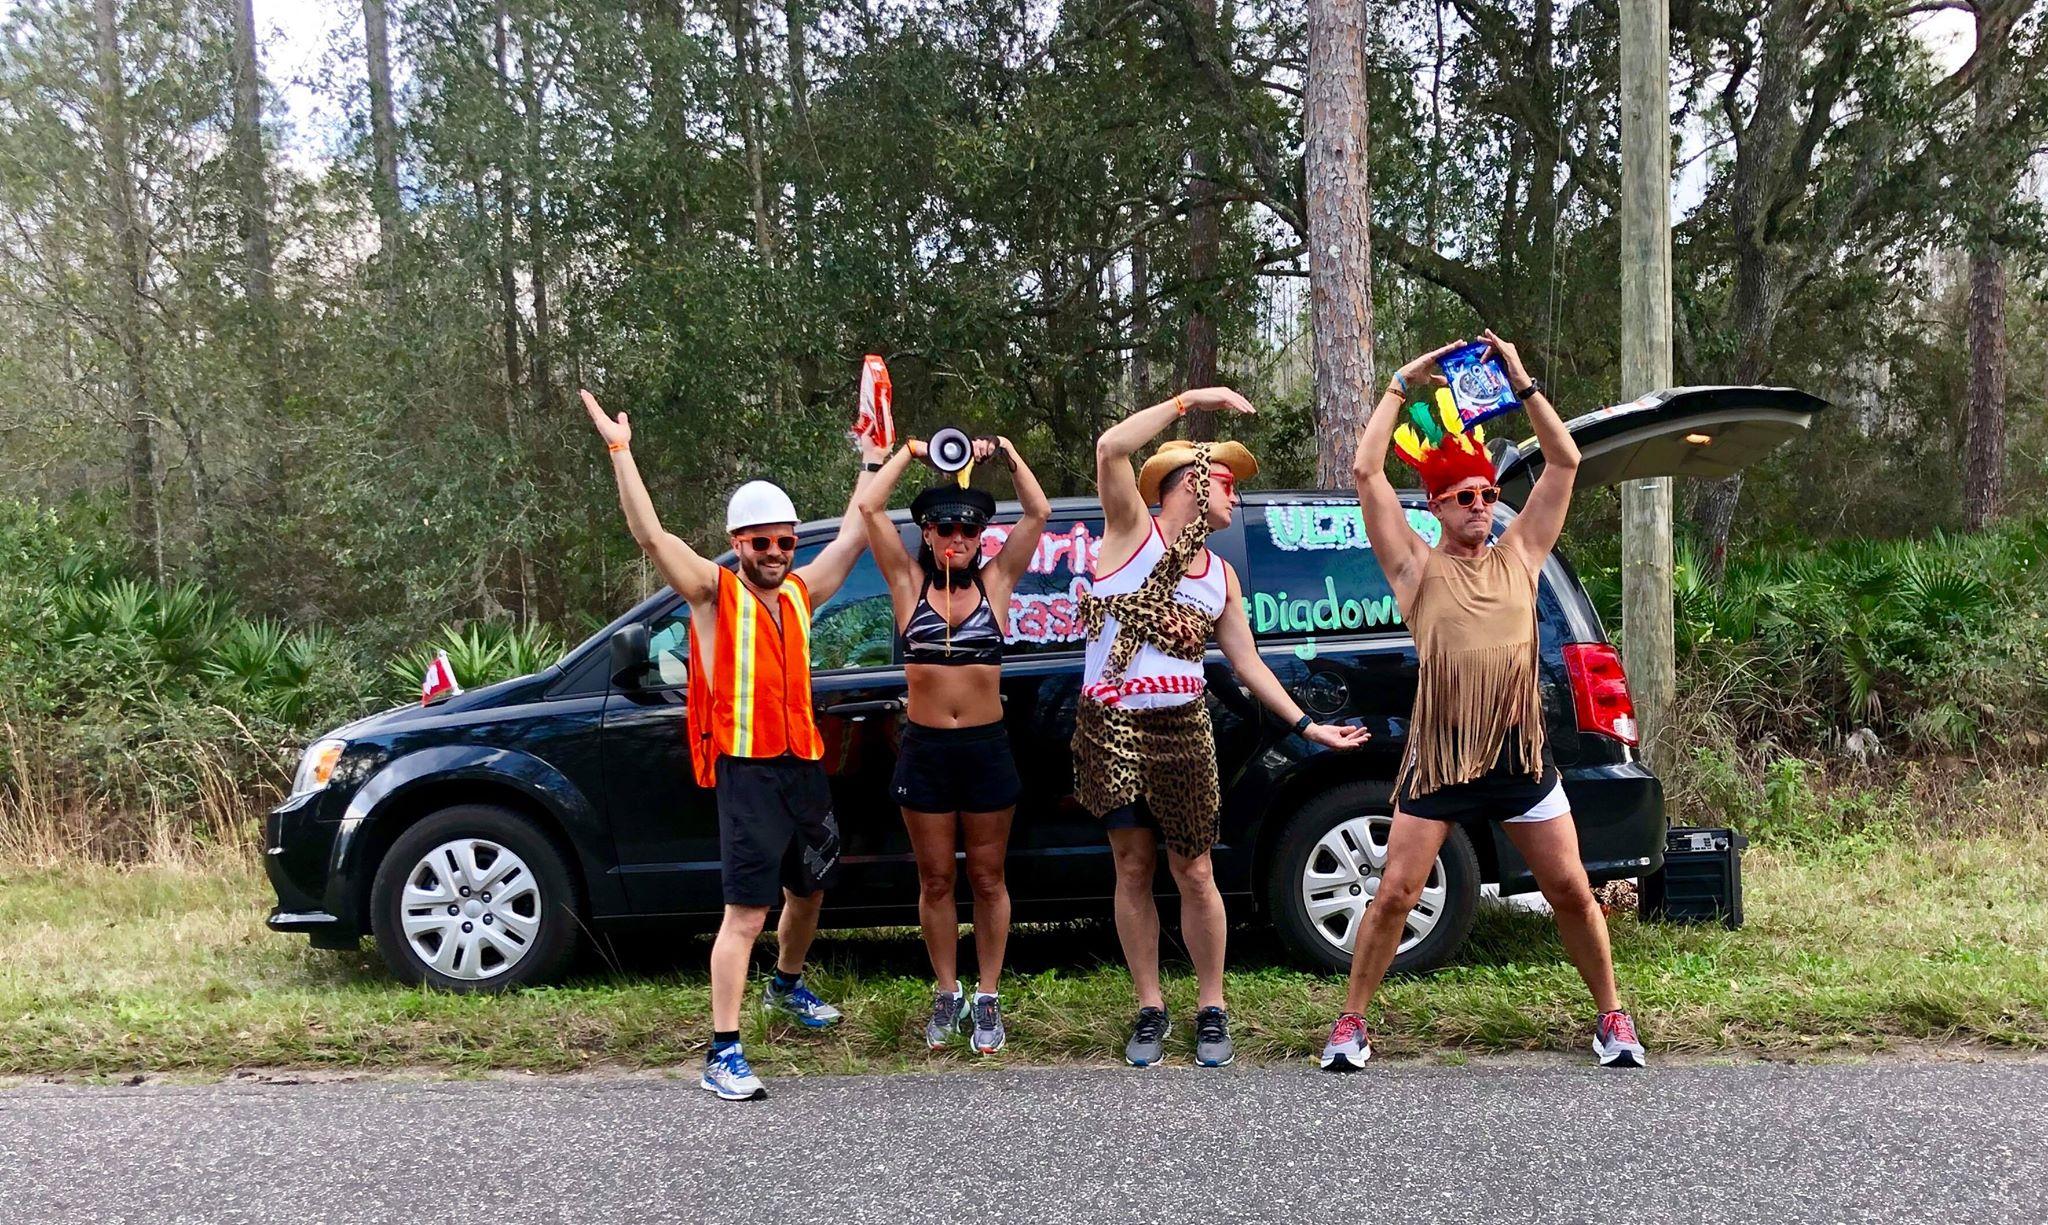 Coach_Terry_Wilson_Pursuit_of_The_Perfect_Race_Ultraman_Florida_Chris_Pollack_20.jpg